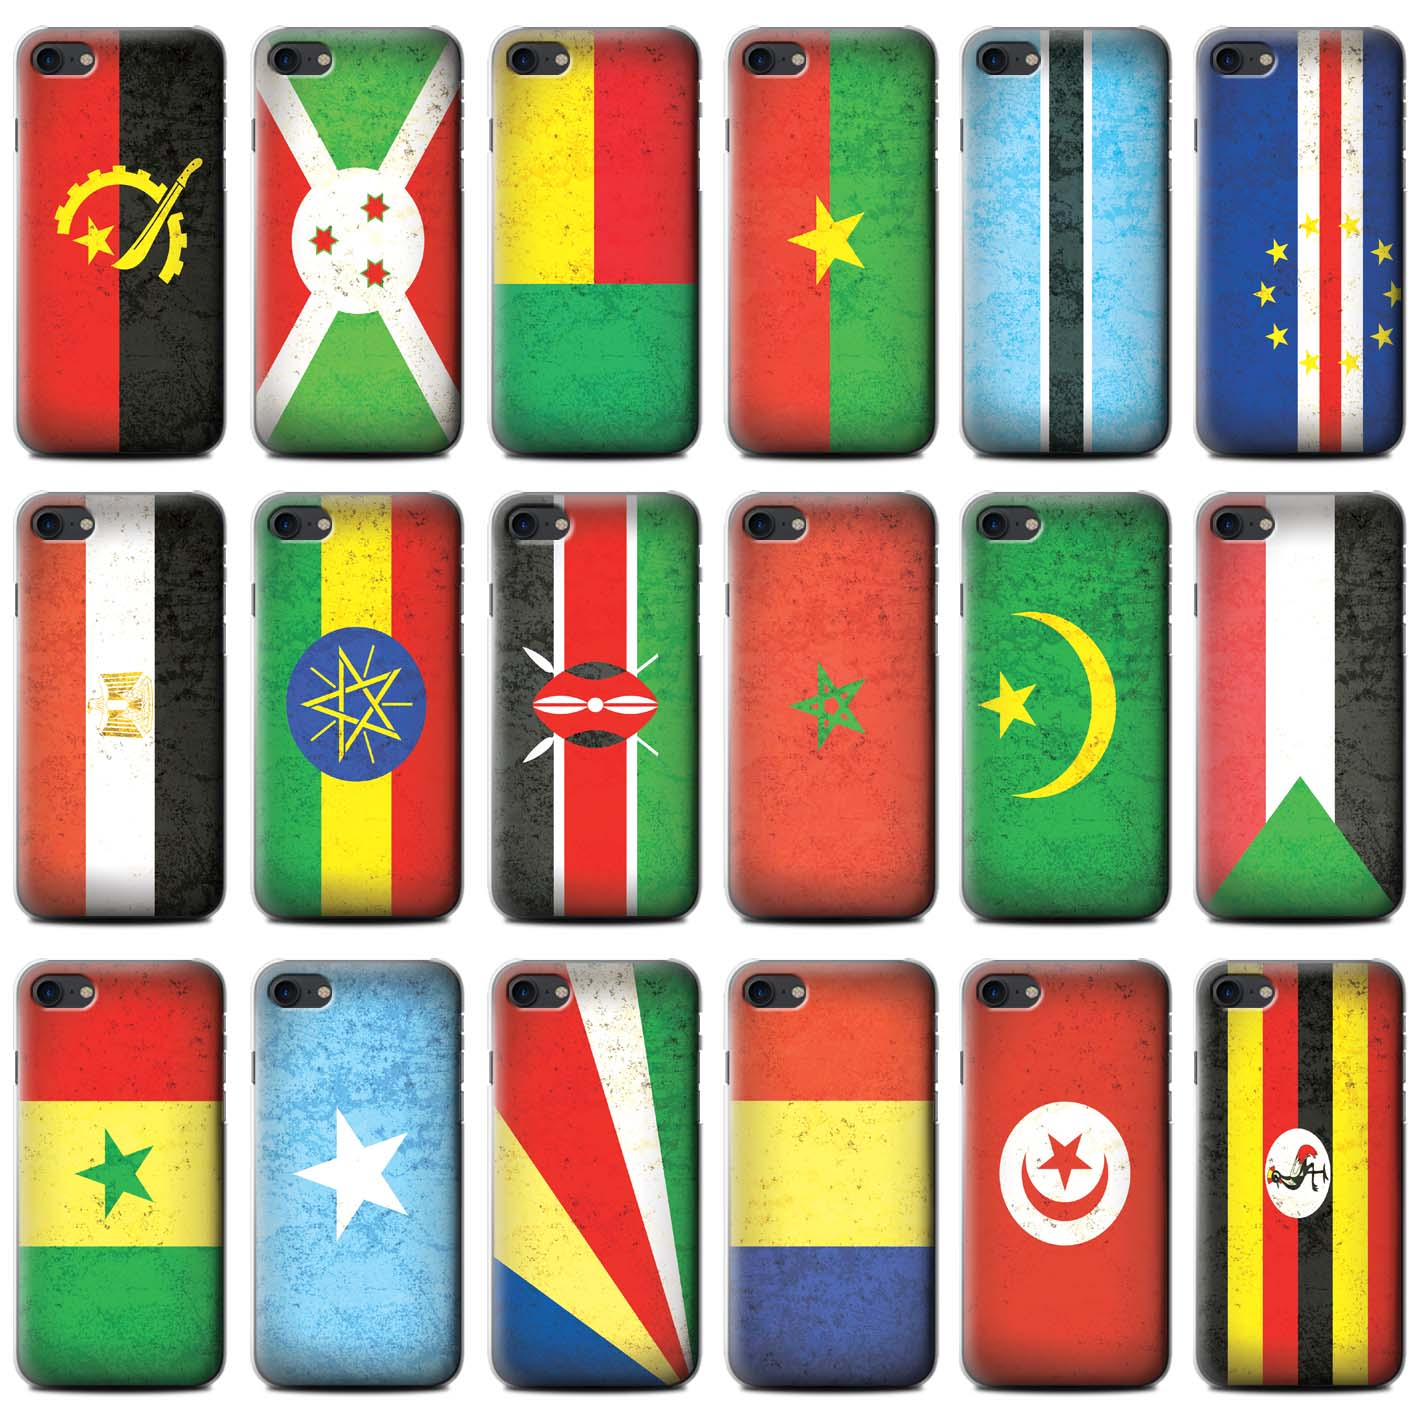 STUFF4-Coque-Etui-Gel-TPU-pour-LG-G-Smartphone-Drapeau-Africain-Housse